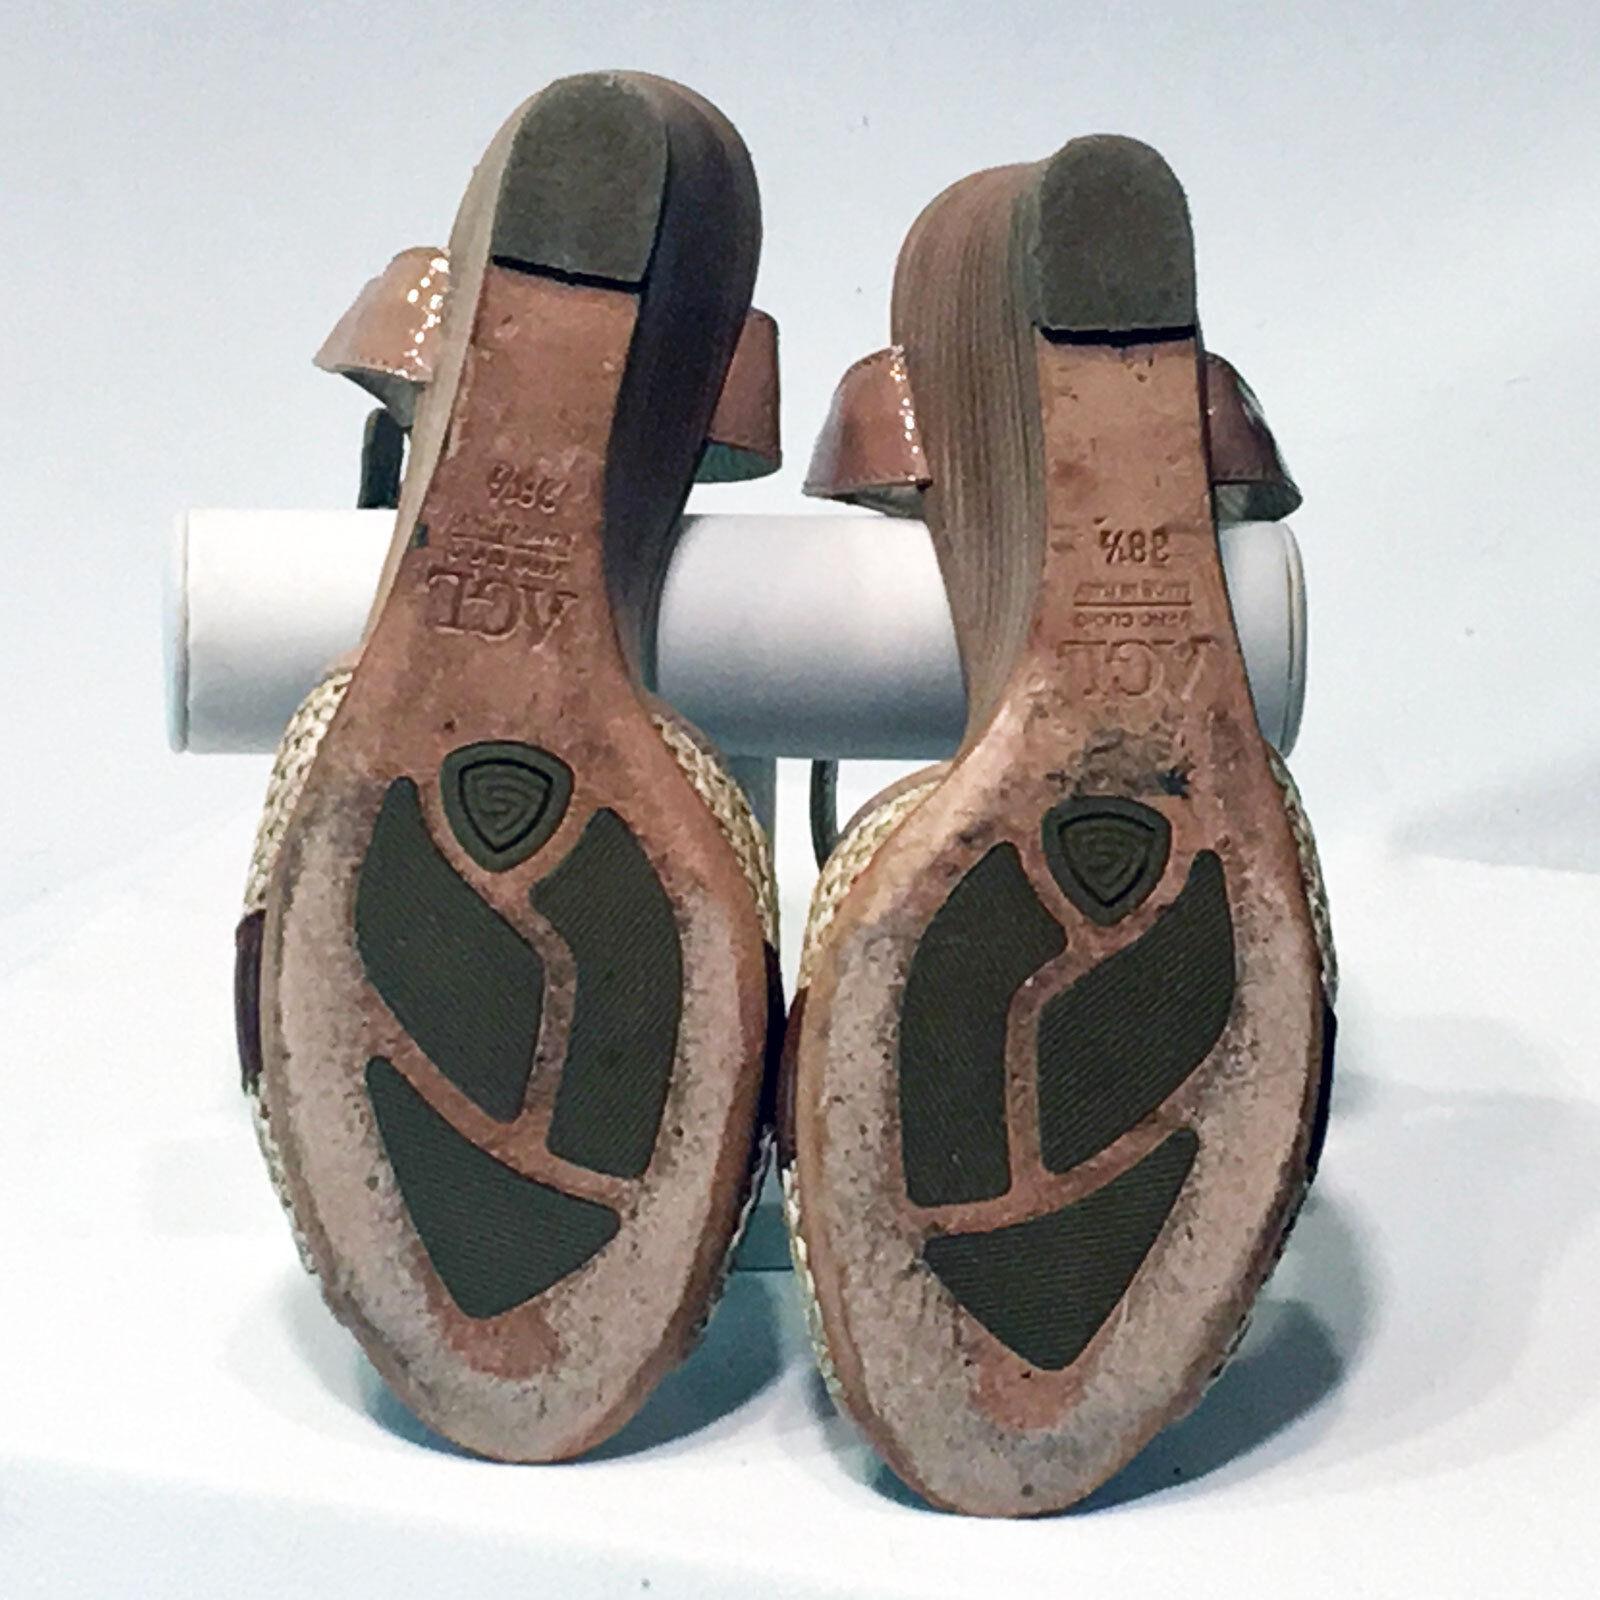 AGL Attilio Giusti Leombruni   Beige Patent Leather Leather Leather Wedge Heels – Größe 38.5 M 991aac